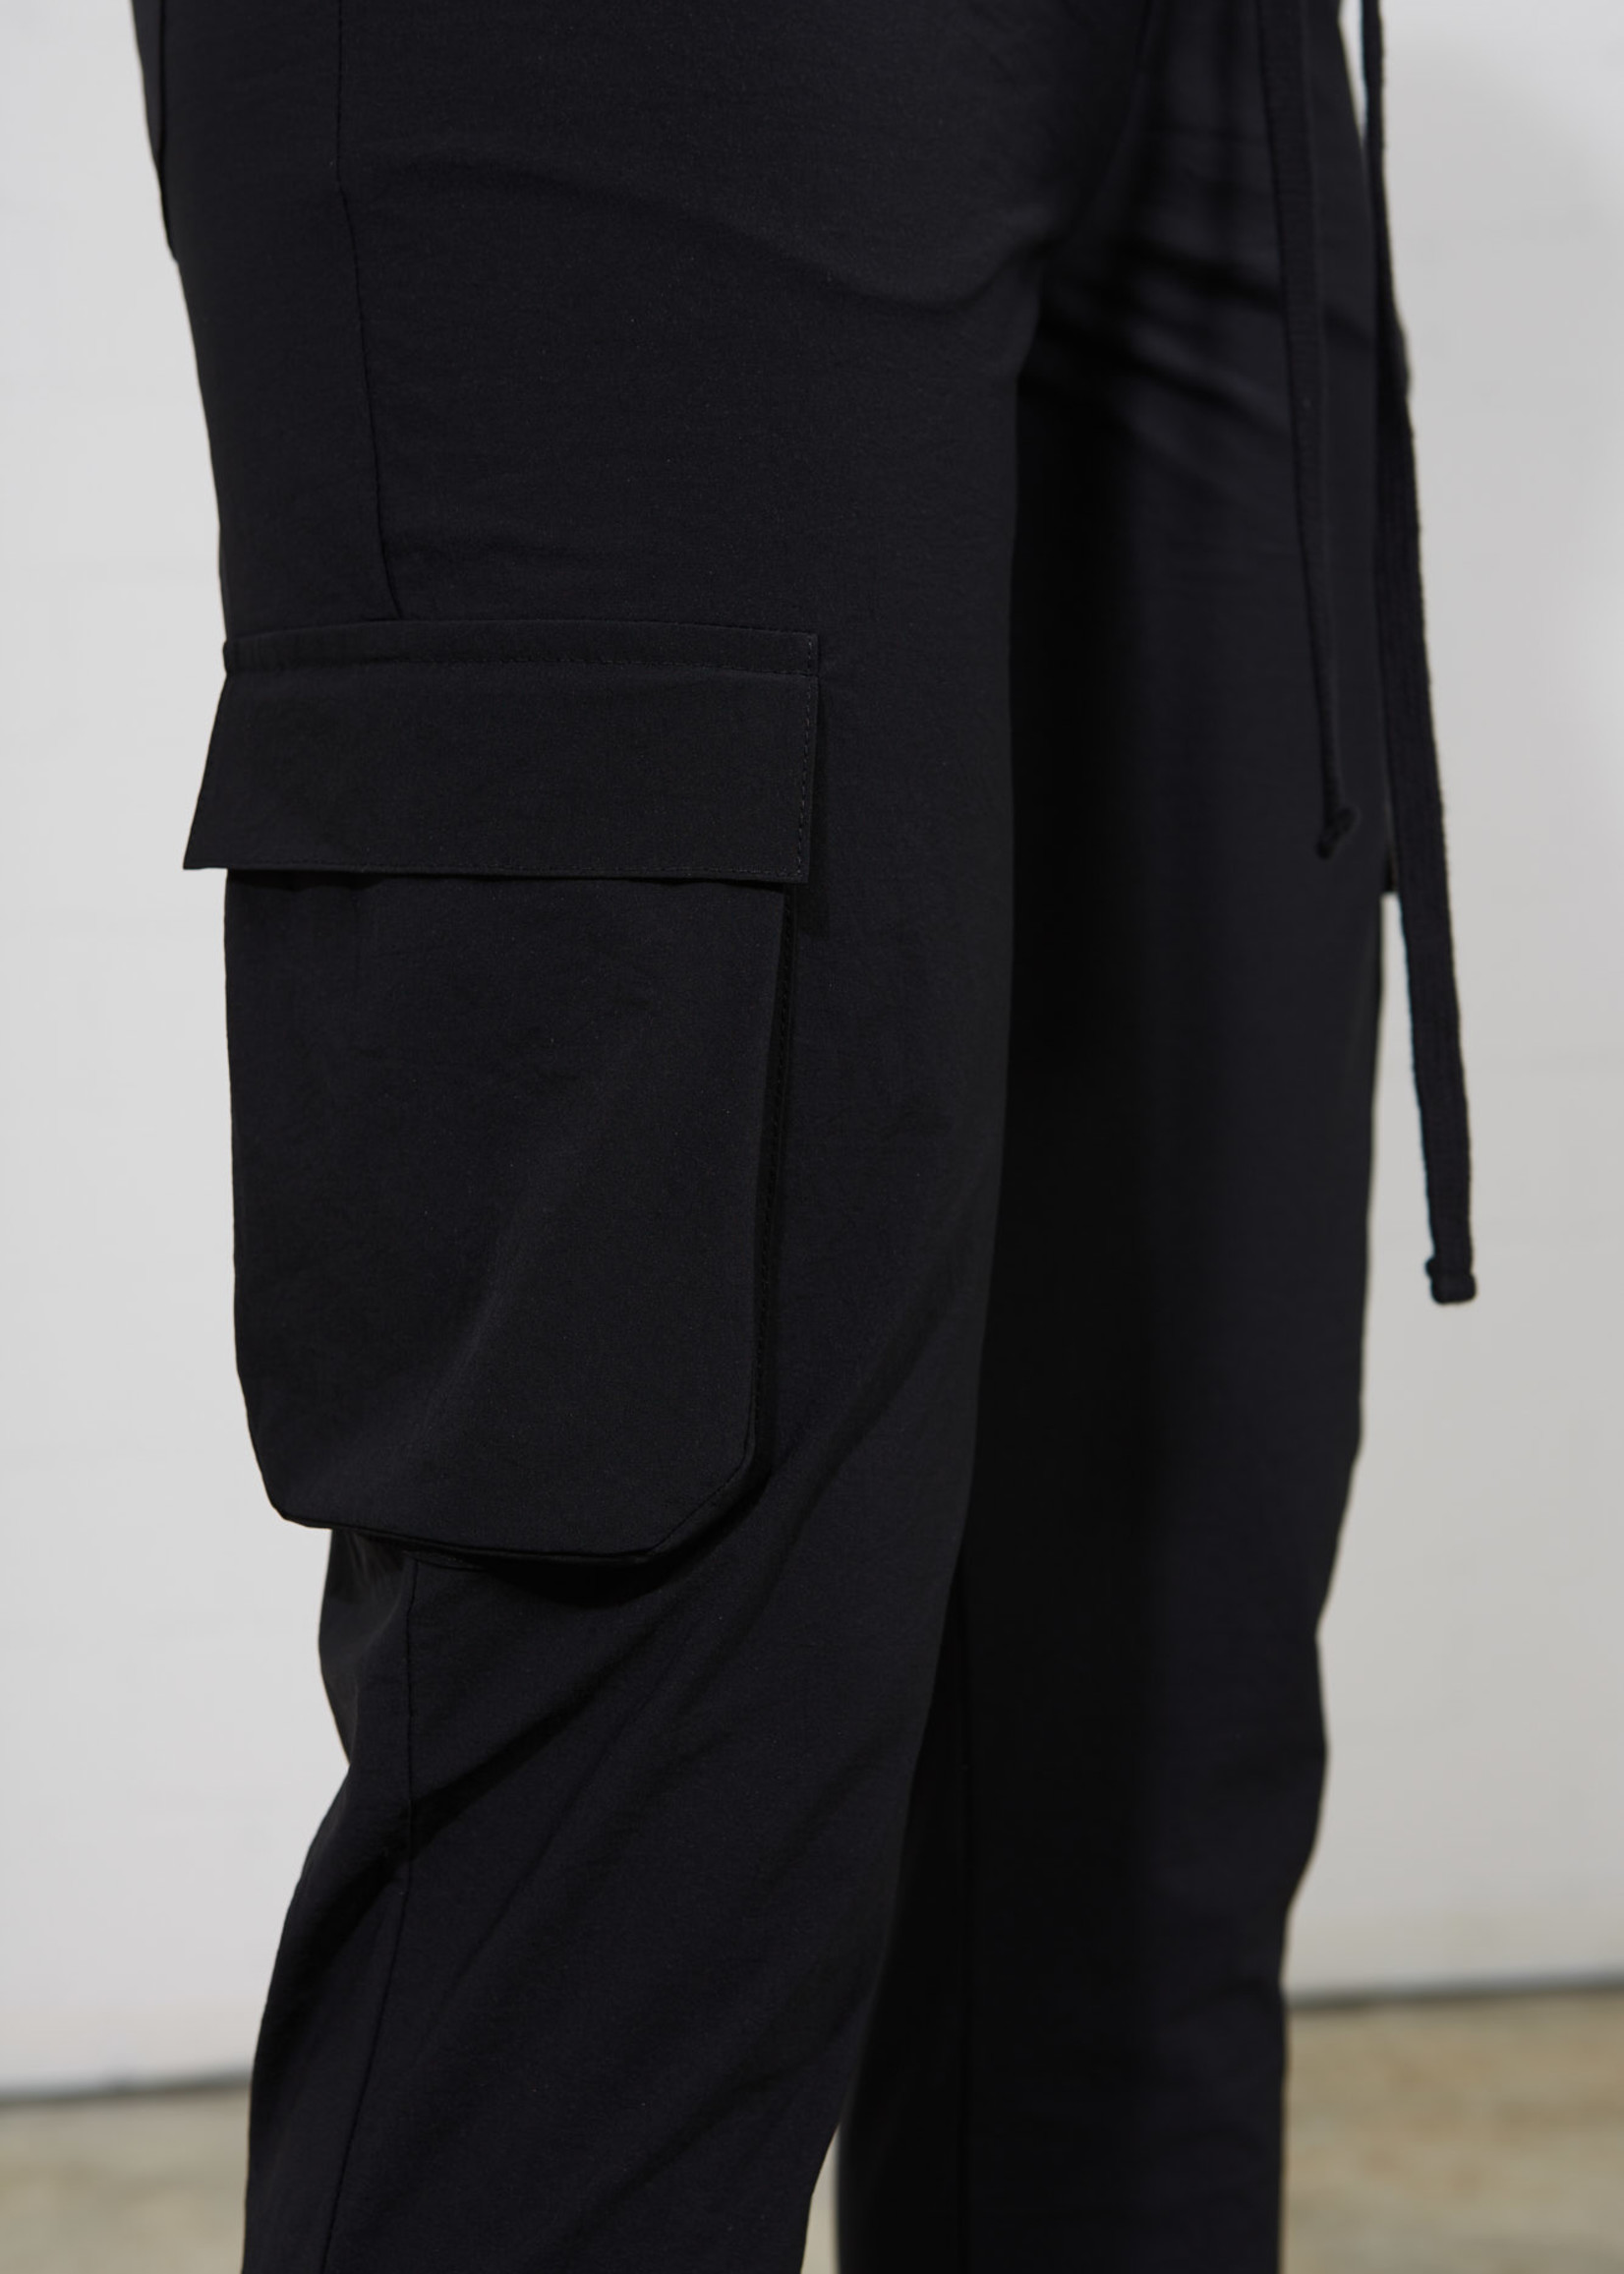 Thom krom Thom Krom jogging pants Black